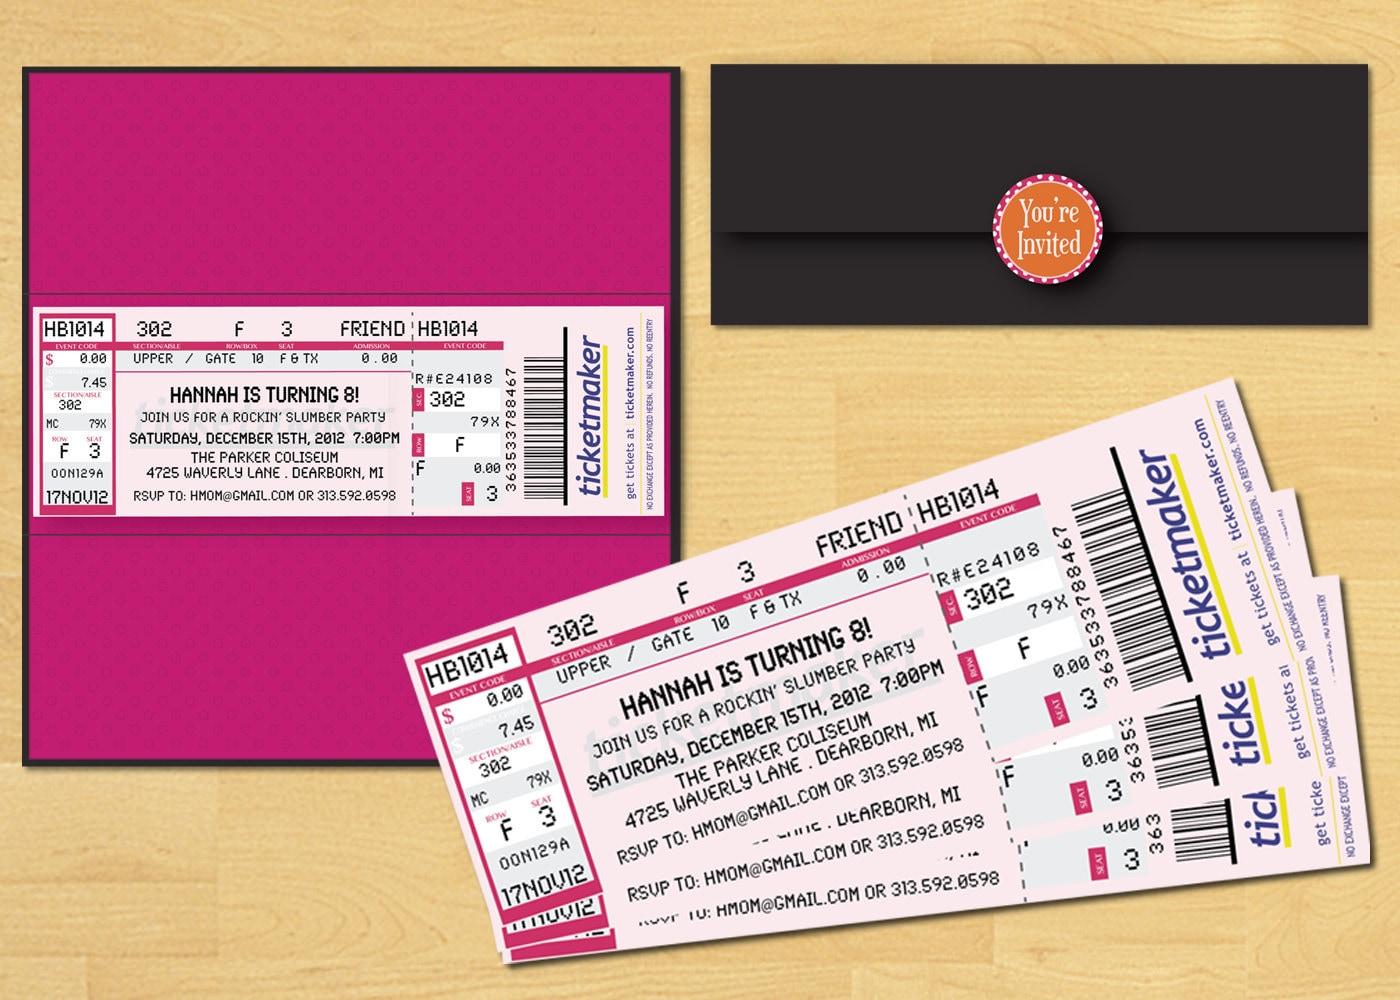 Microsoft Office Meeting Agenda Templatefree admit one ticket – Movie Ticket Invitations Printable Free